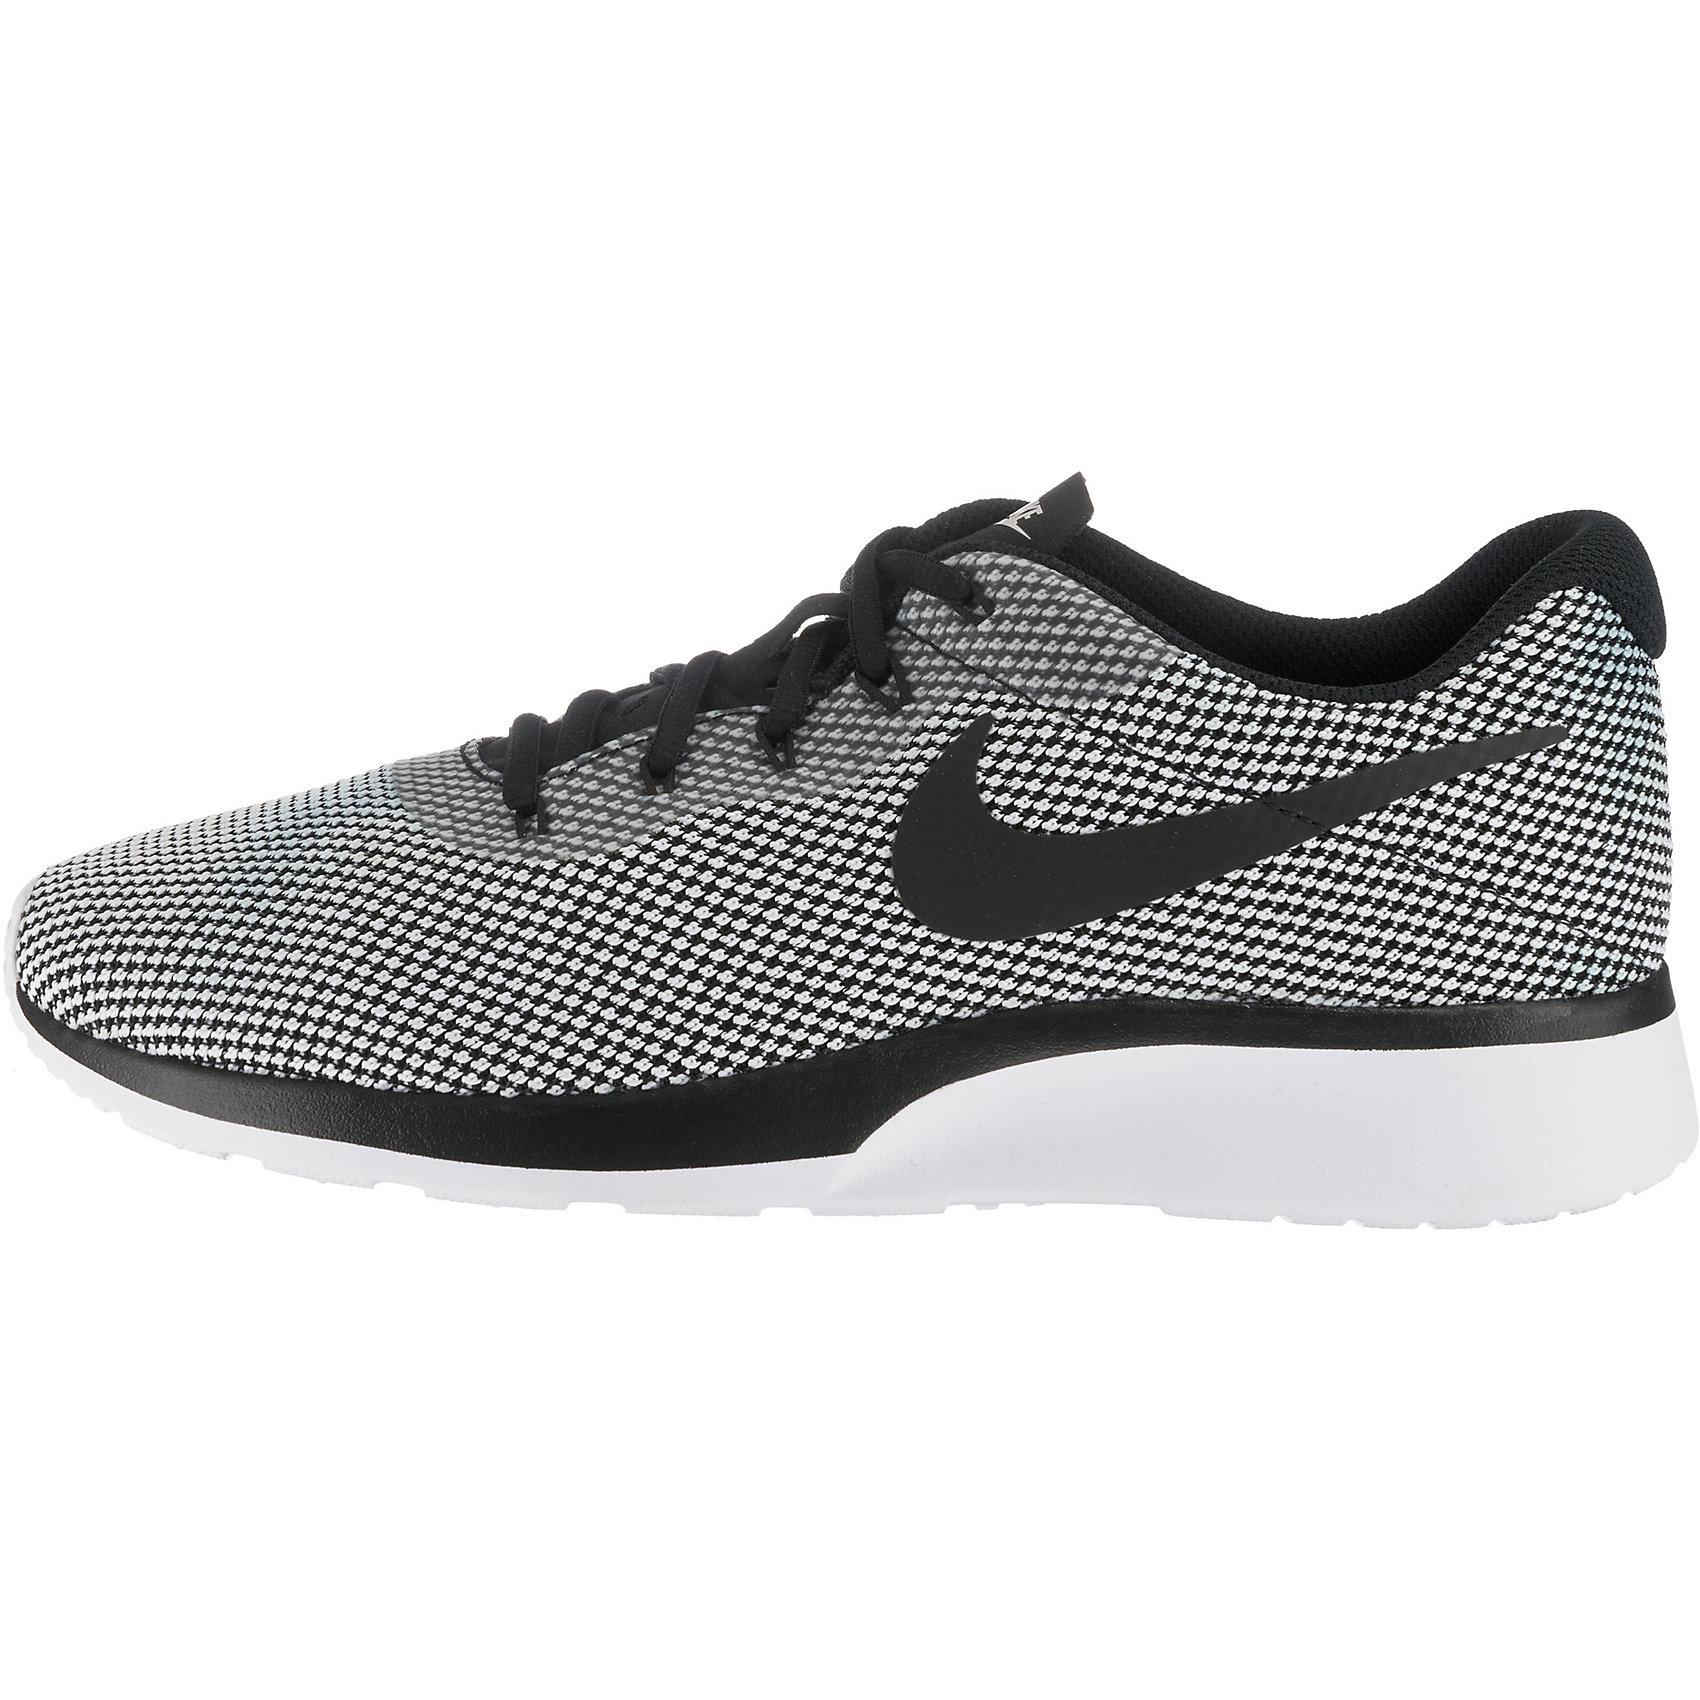 Neu Nike Sportswear Tanjun Herren Racer Sneakers 7631478 für Herren Tanjun schwarz d07cc8